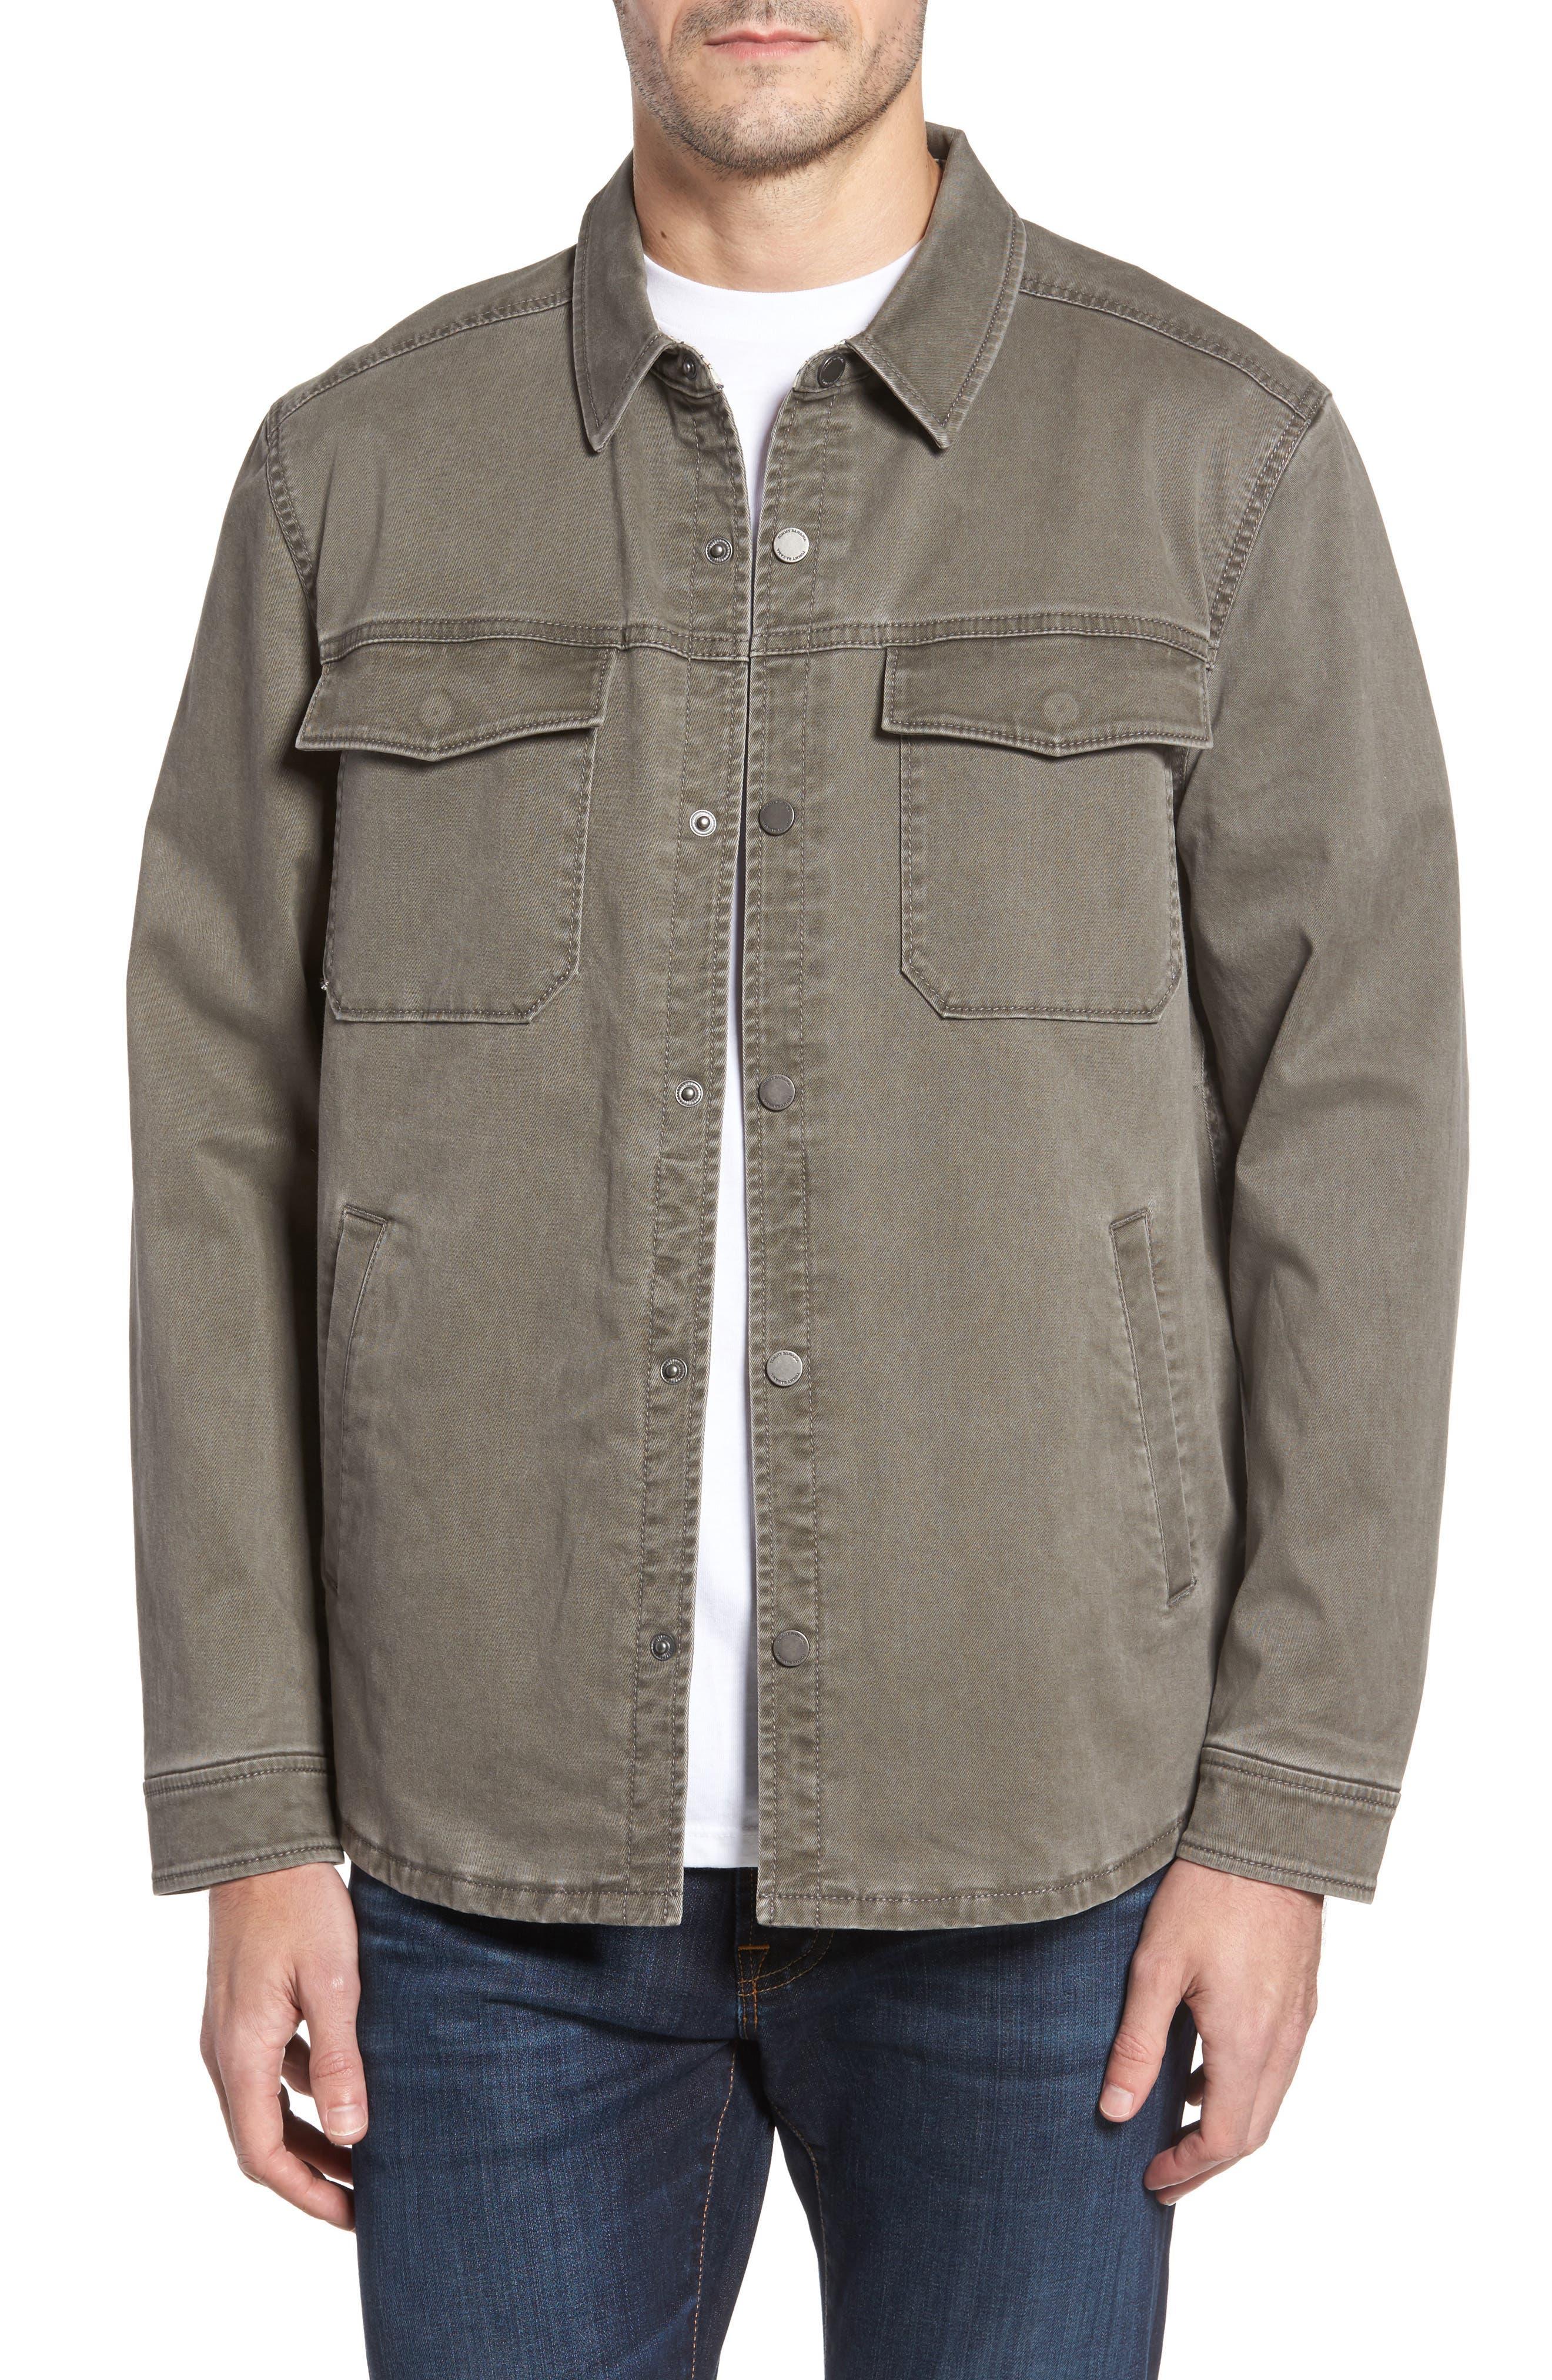 Alternate Image 1 Selected - Tommy Bahama Sea Glass Shirt Jacket